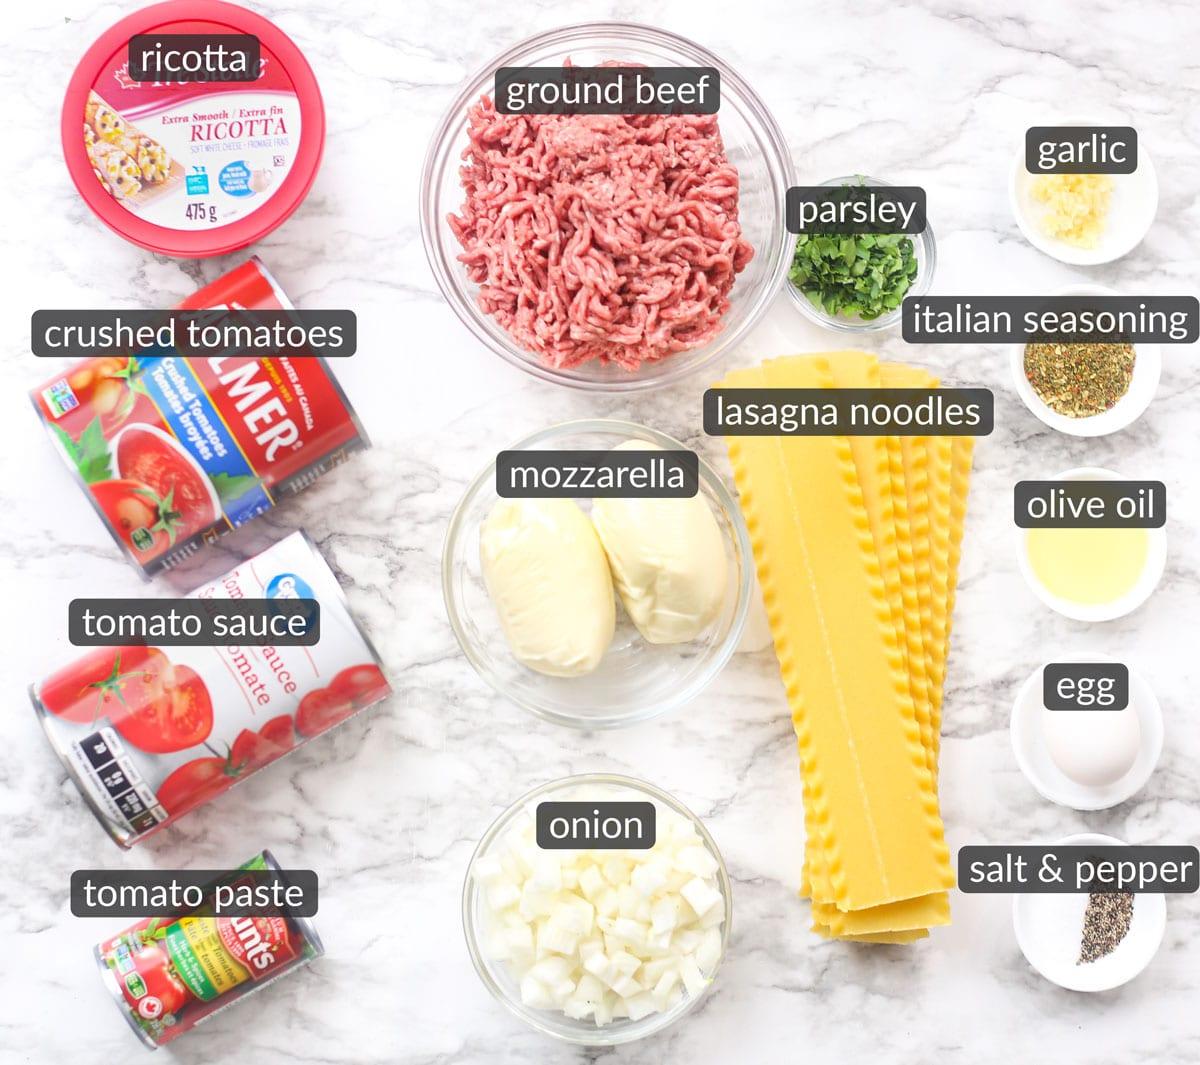 ingredients used to make homemade lasagna